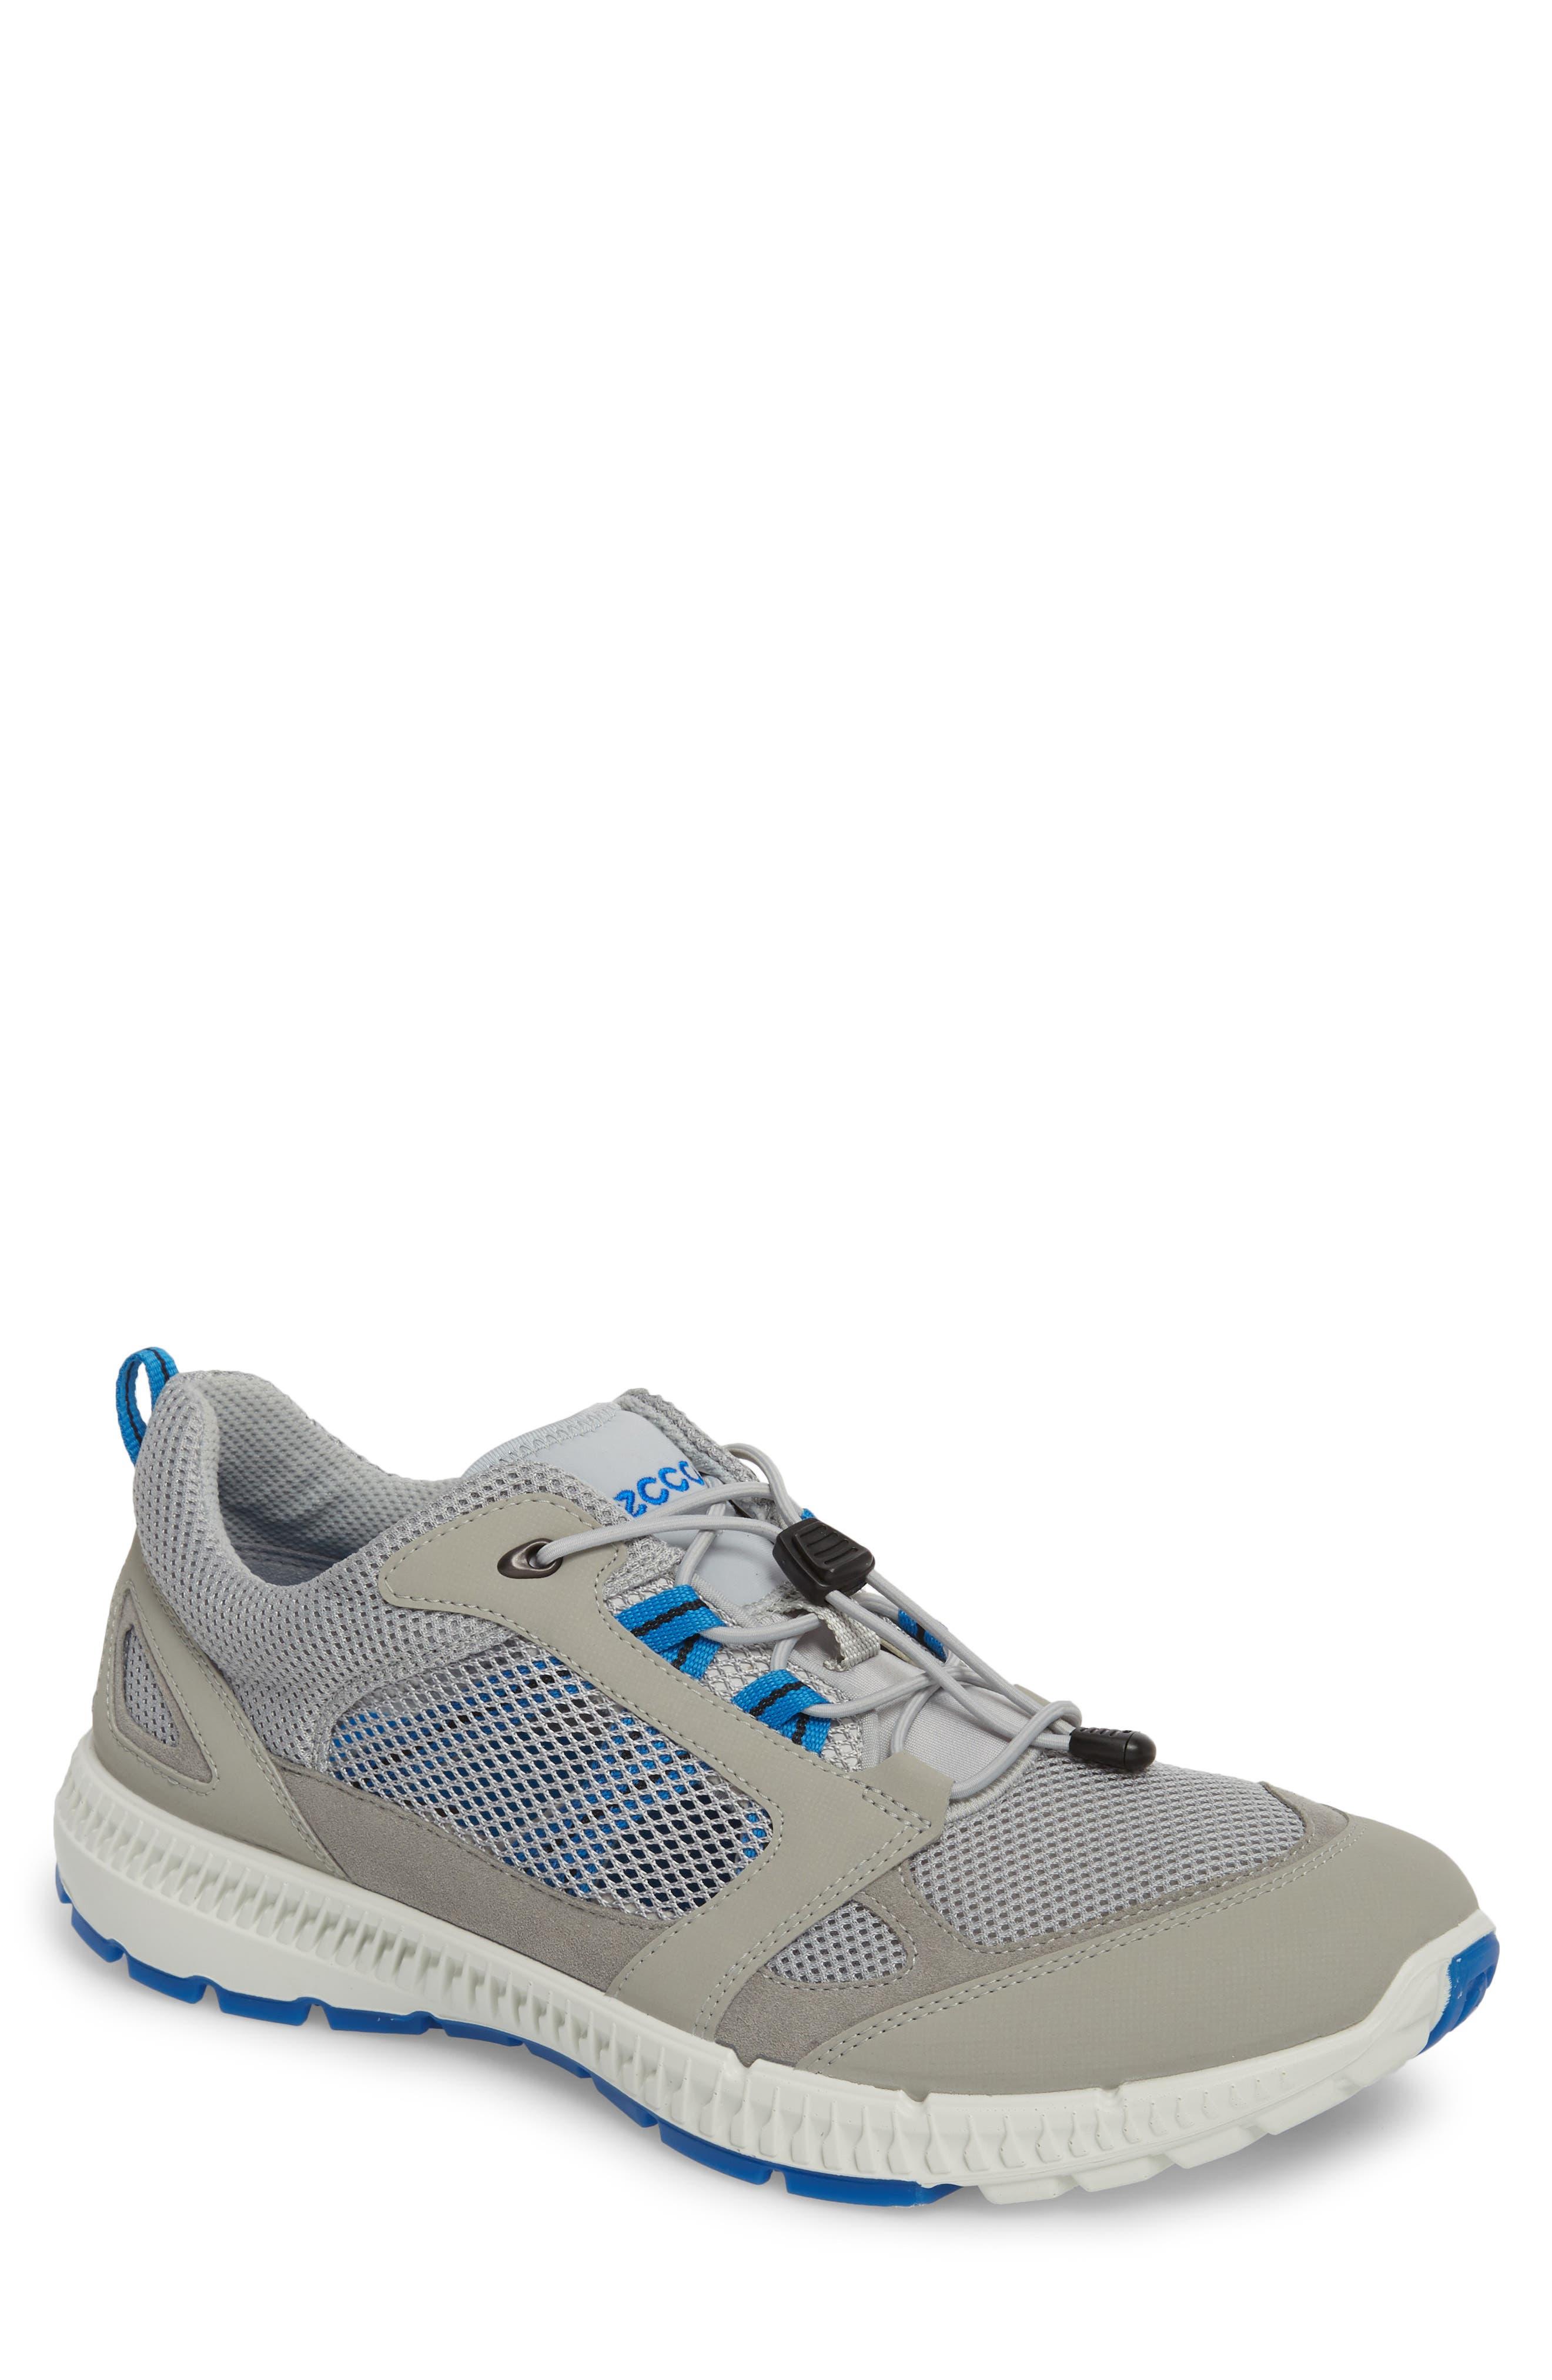 Terracruise II Sneaker,                         Main,                         color, Wild Dove Leather